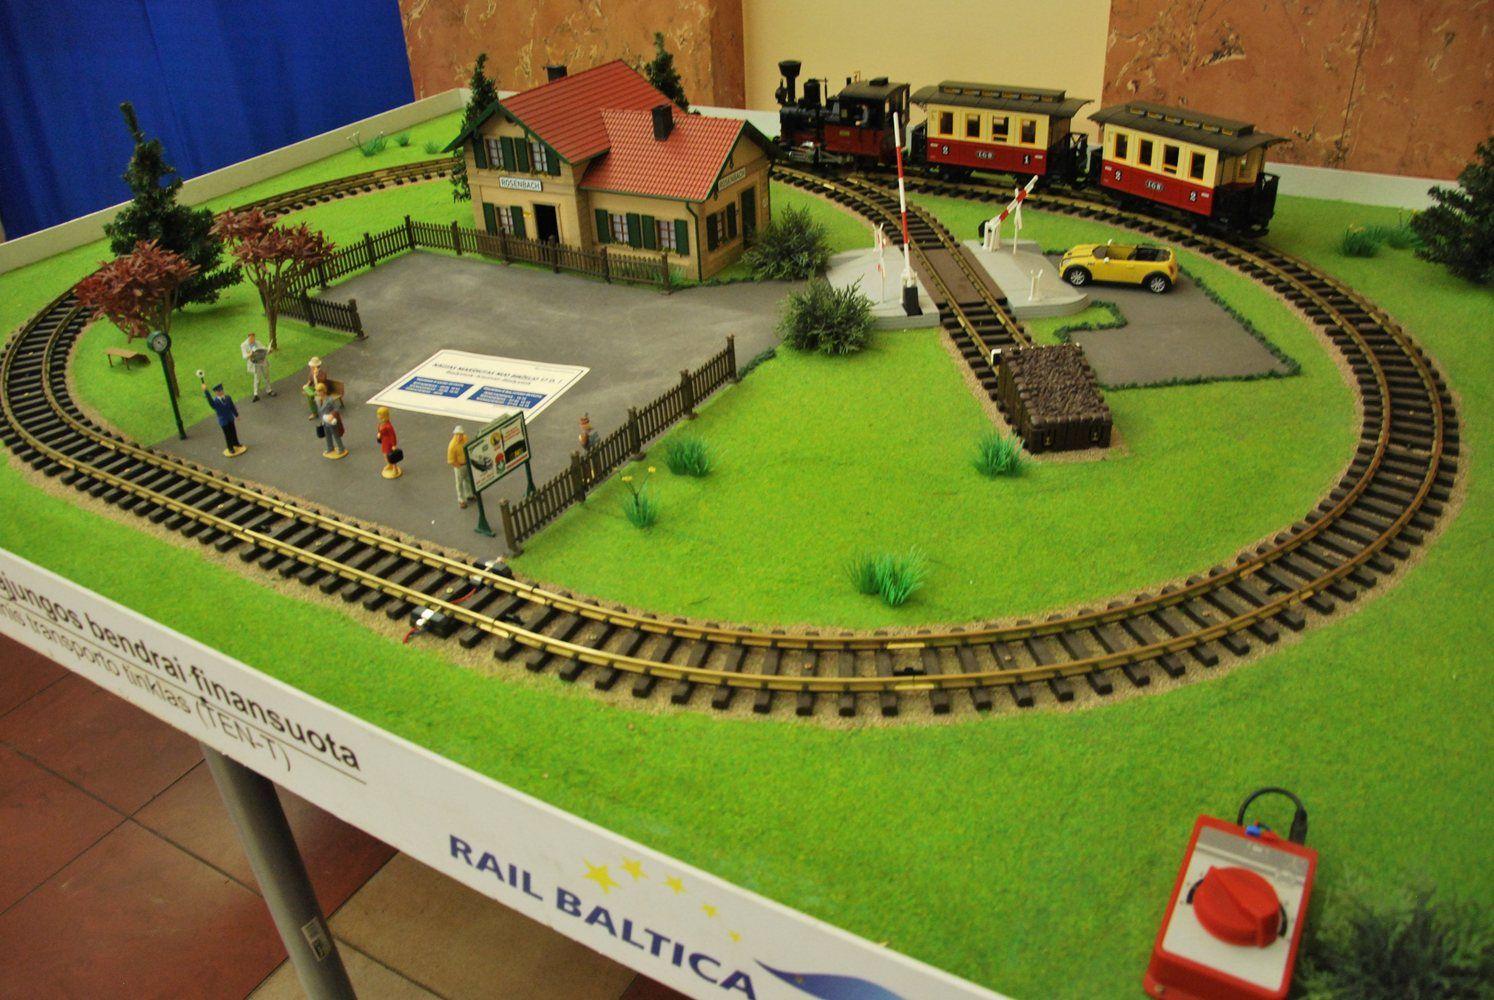 """Rail Baltica"" ieško 90-ties ekspertų"